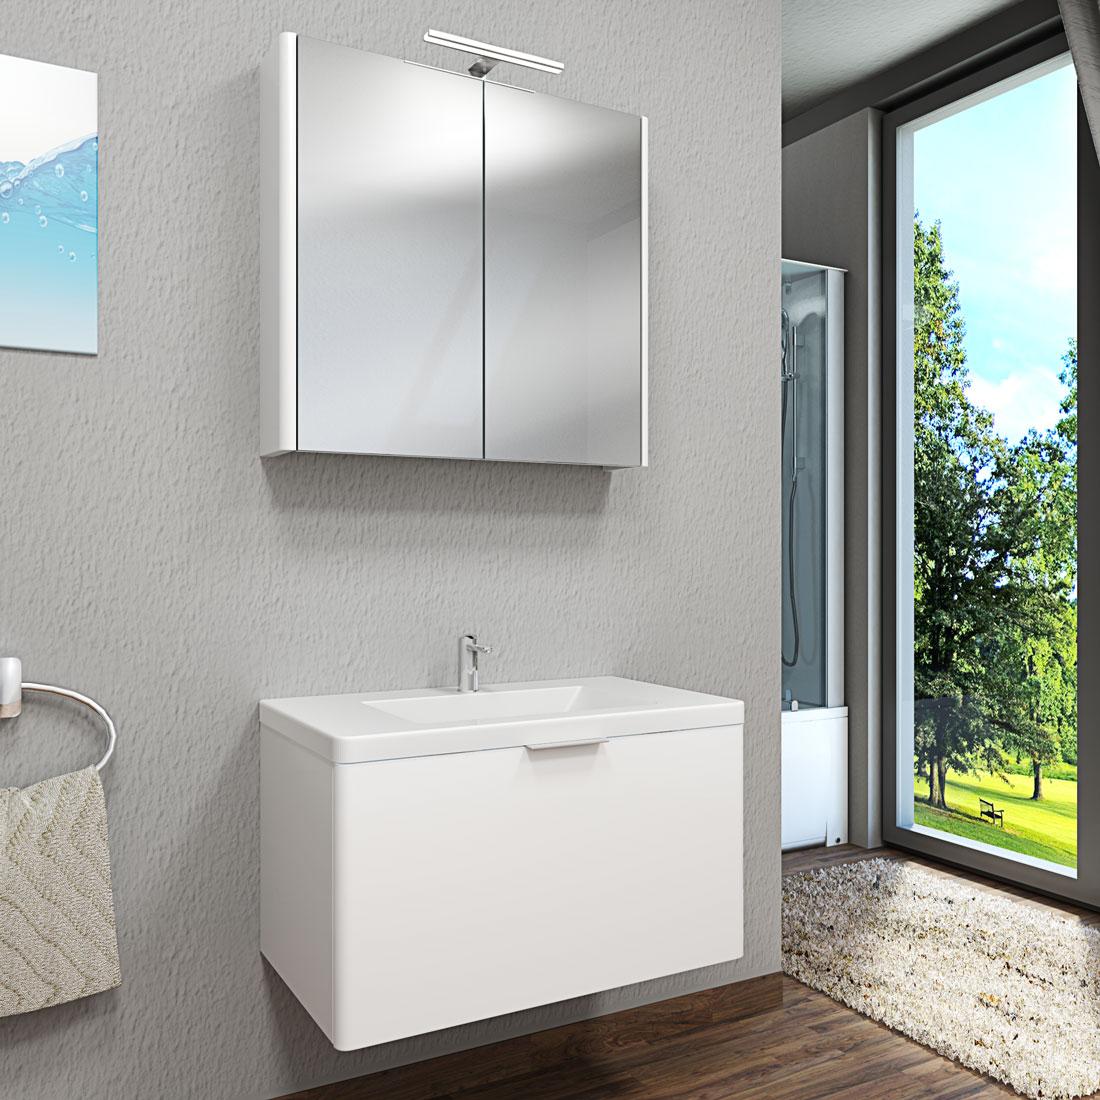 spiegelschrank badspiegel spiegel curve 80cm mdf. Black Bedroom Furniture Sets. Home Design Ideas